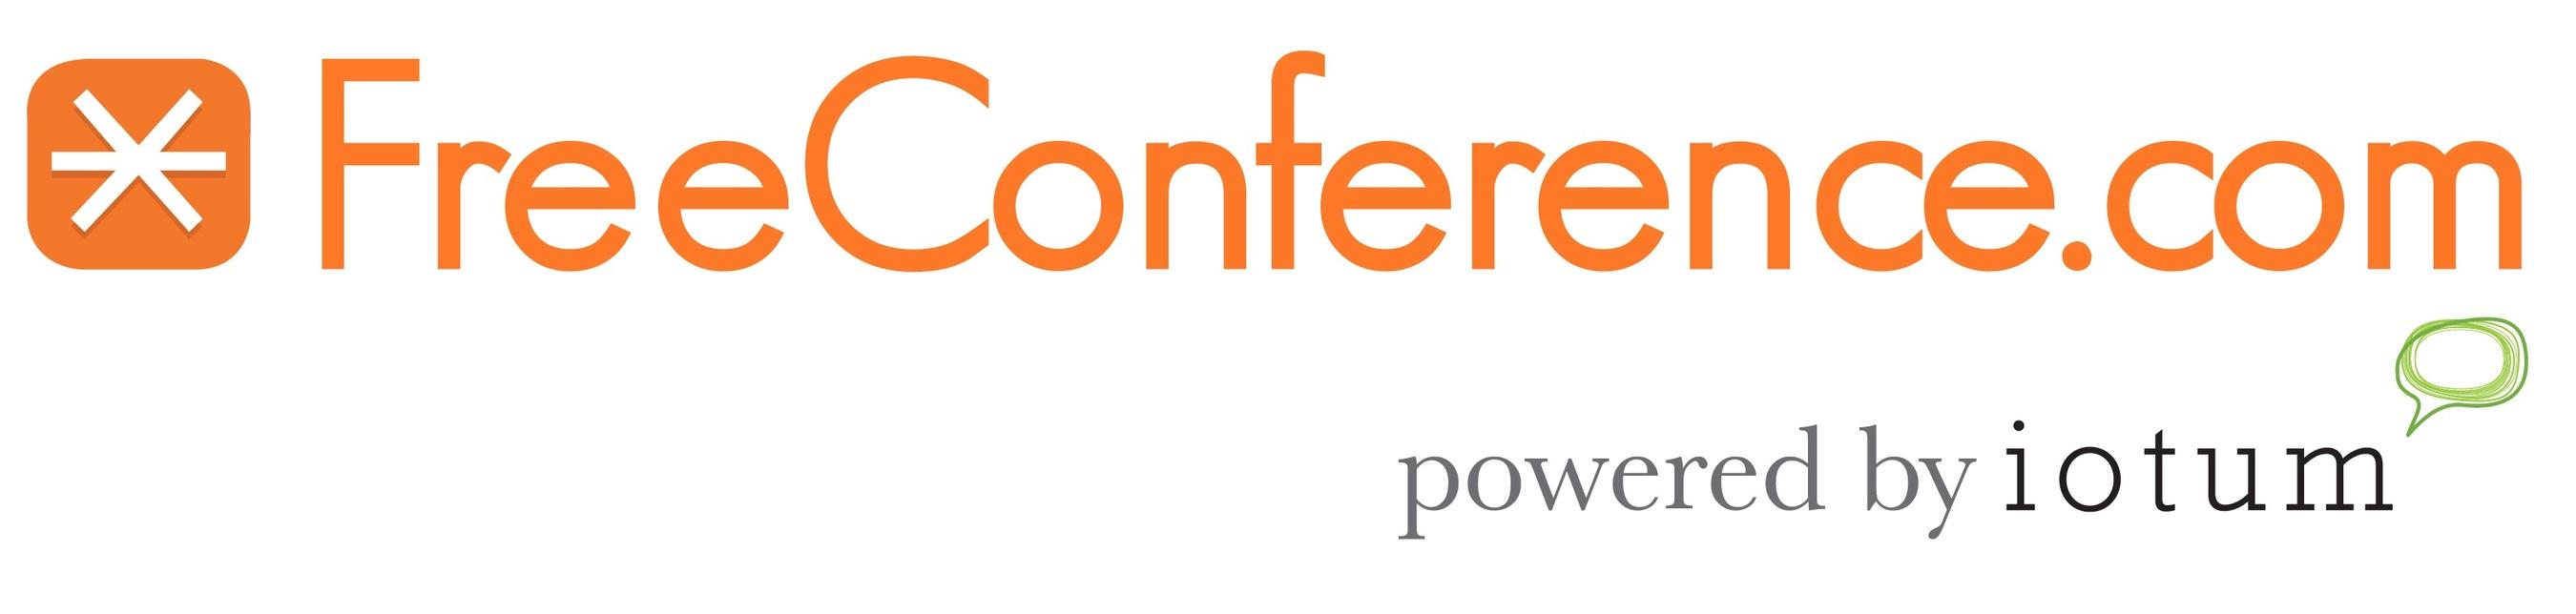 iotum Inc. Calliflower conference calling service.